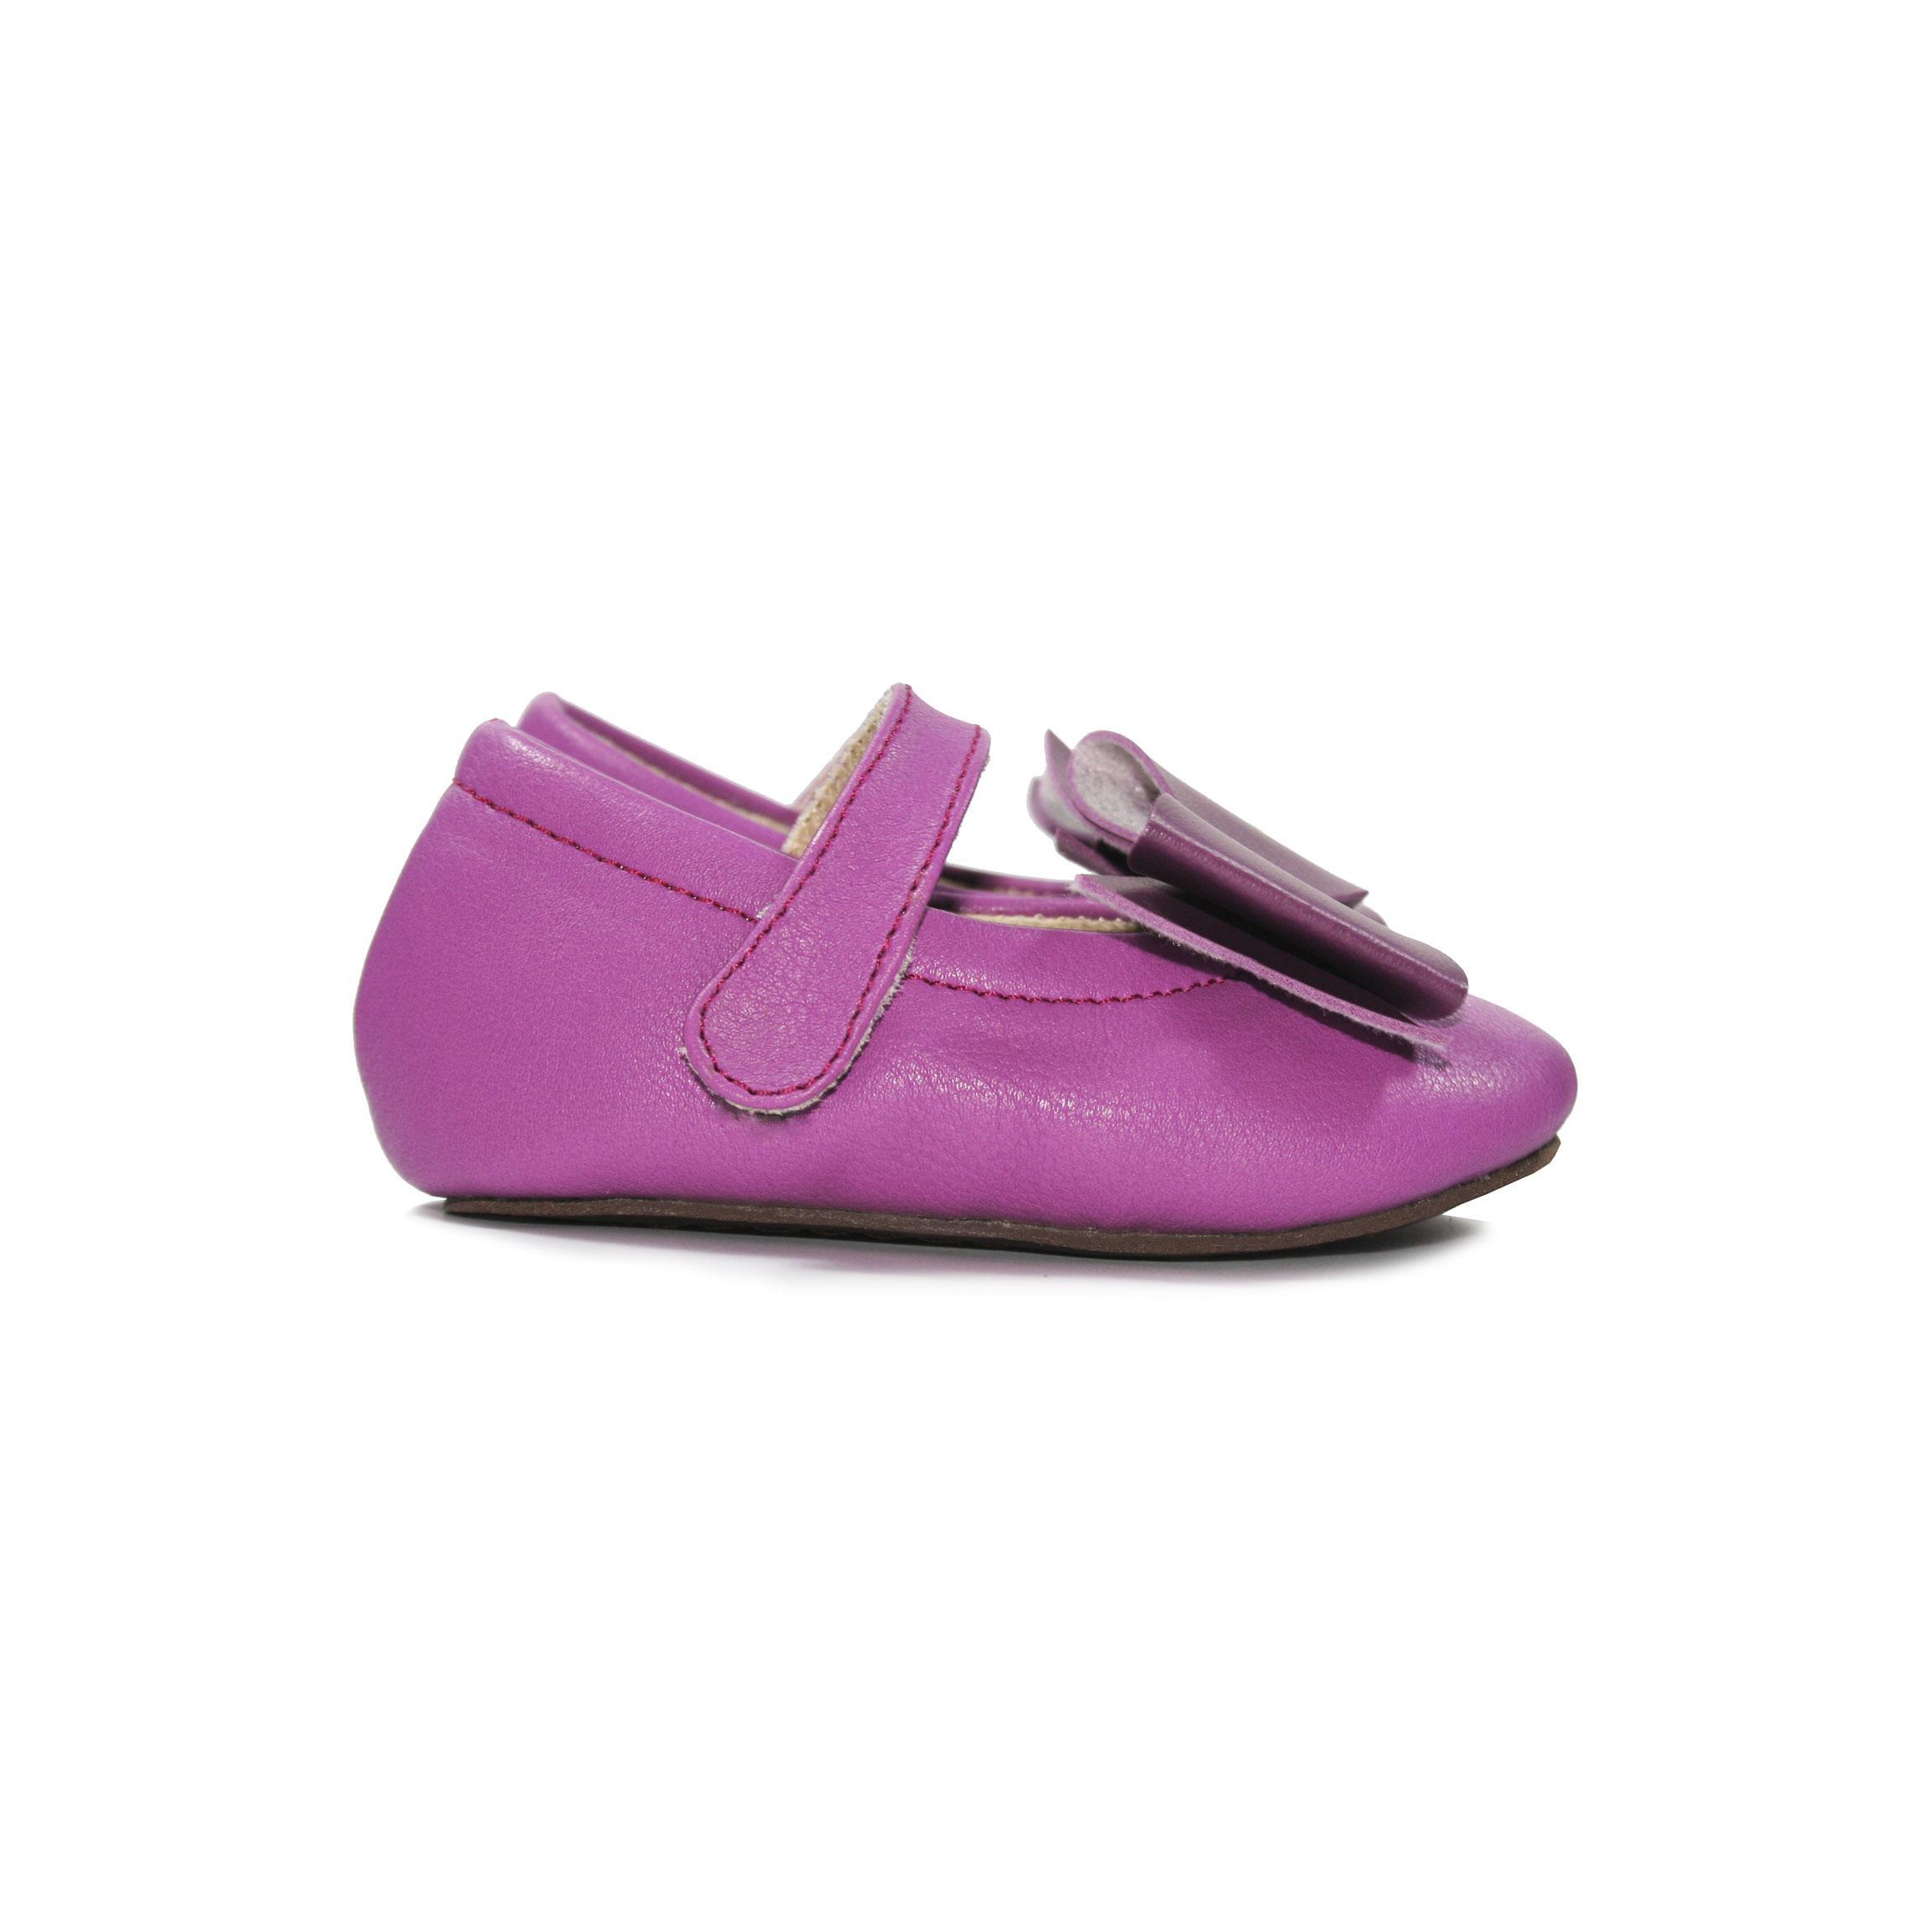 Tamagoo Sepatu Bayi Perempuan Baby Girl Shoes Prewalker Mischka Masson Silver  Branded 3 6 Bulan Gwen Grey Murah